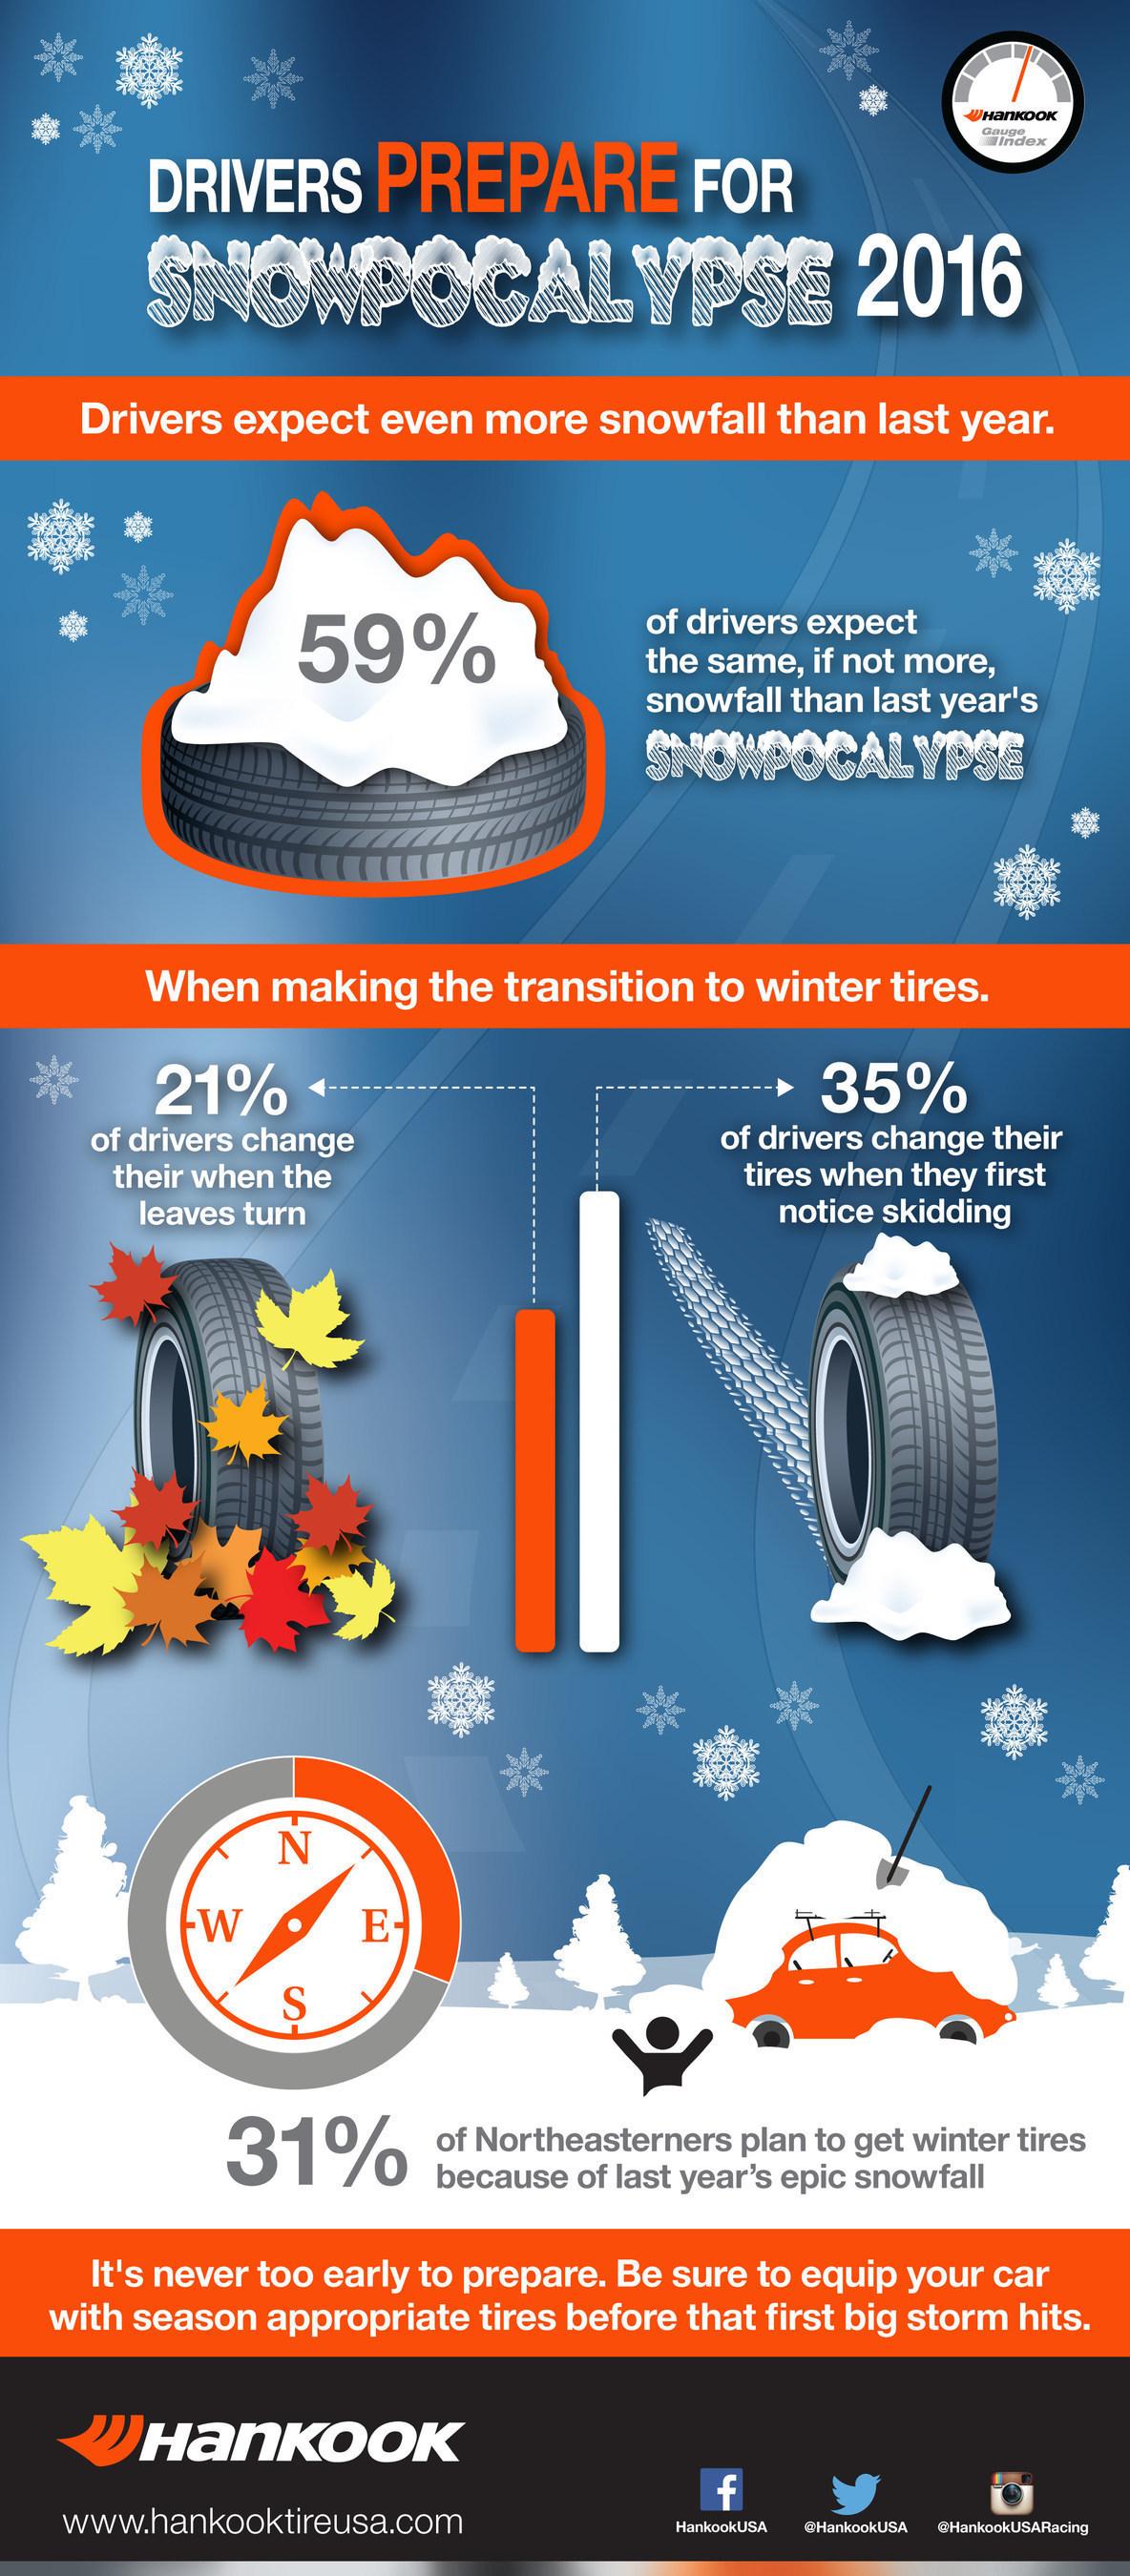 Drivers Prepare For Snowpocalypse 2016